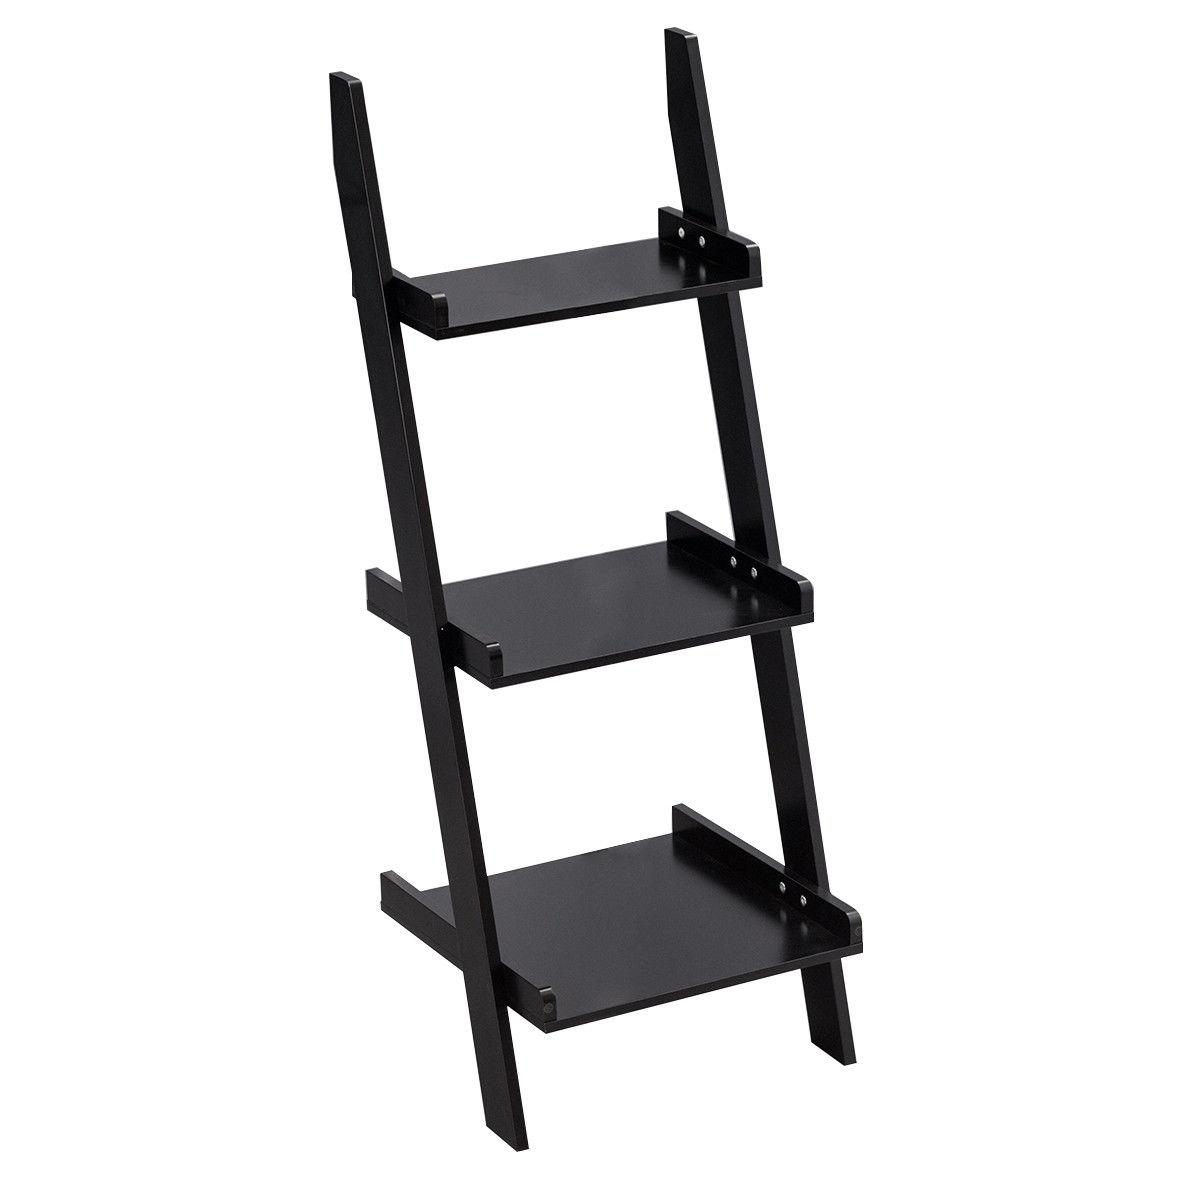 3 Tier Leaning Wall Ladder Display Planting Storage Rack